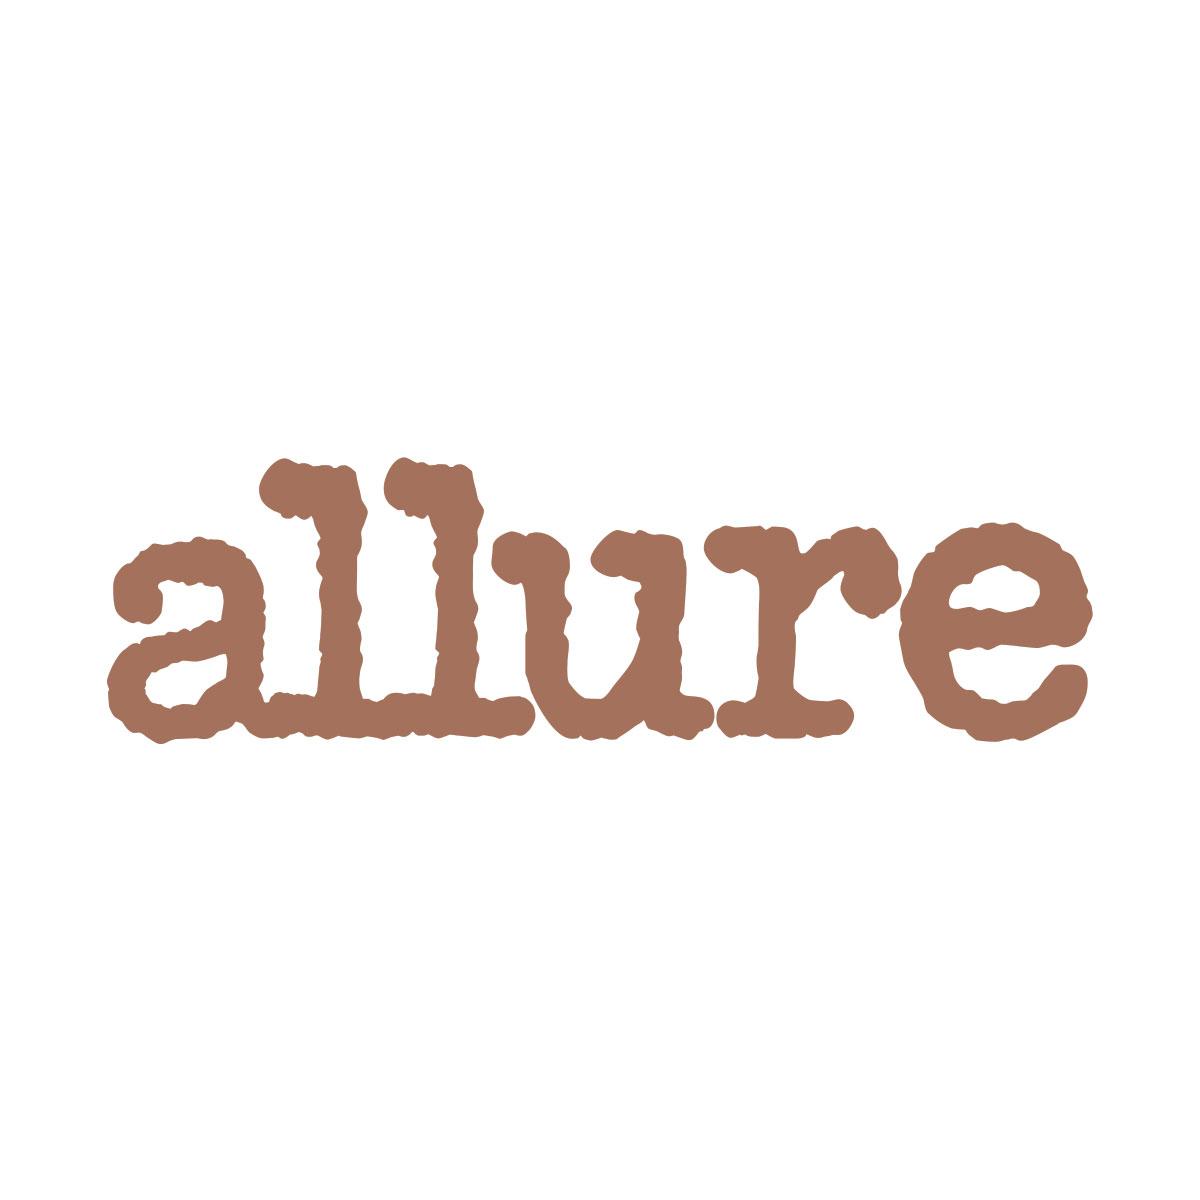 Allure.jpg